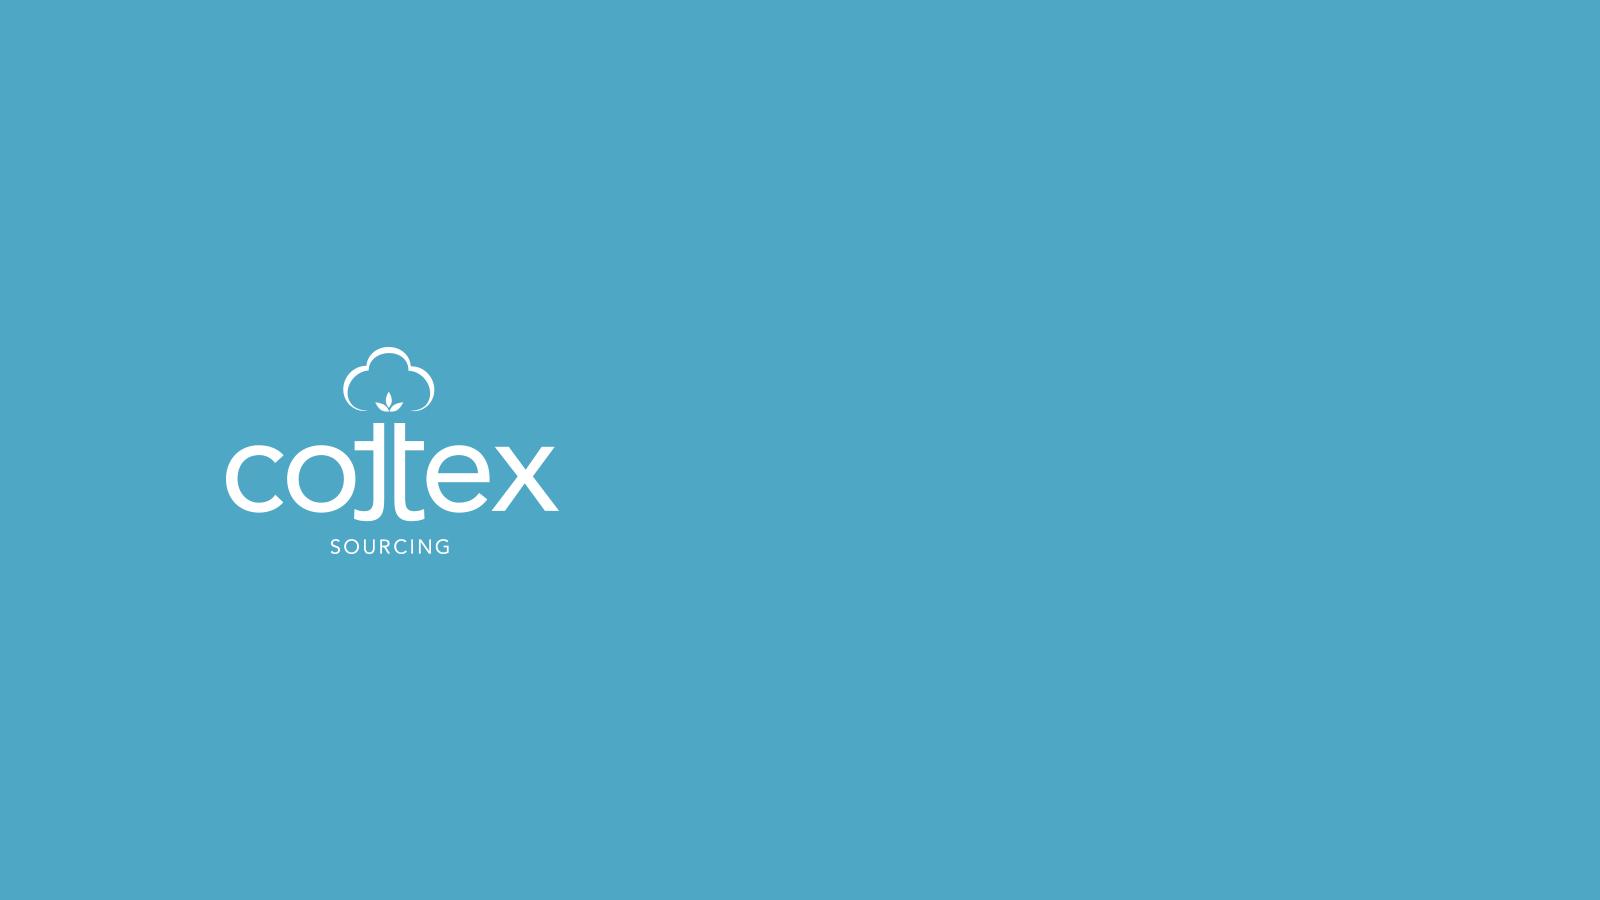 graphic-brand-design-web-designer-hiline-lahore-pakistan-cottex-sourcing-banner